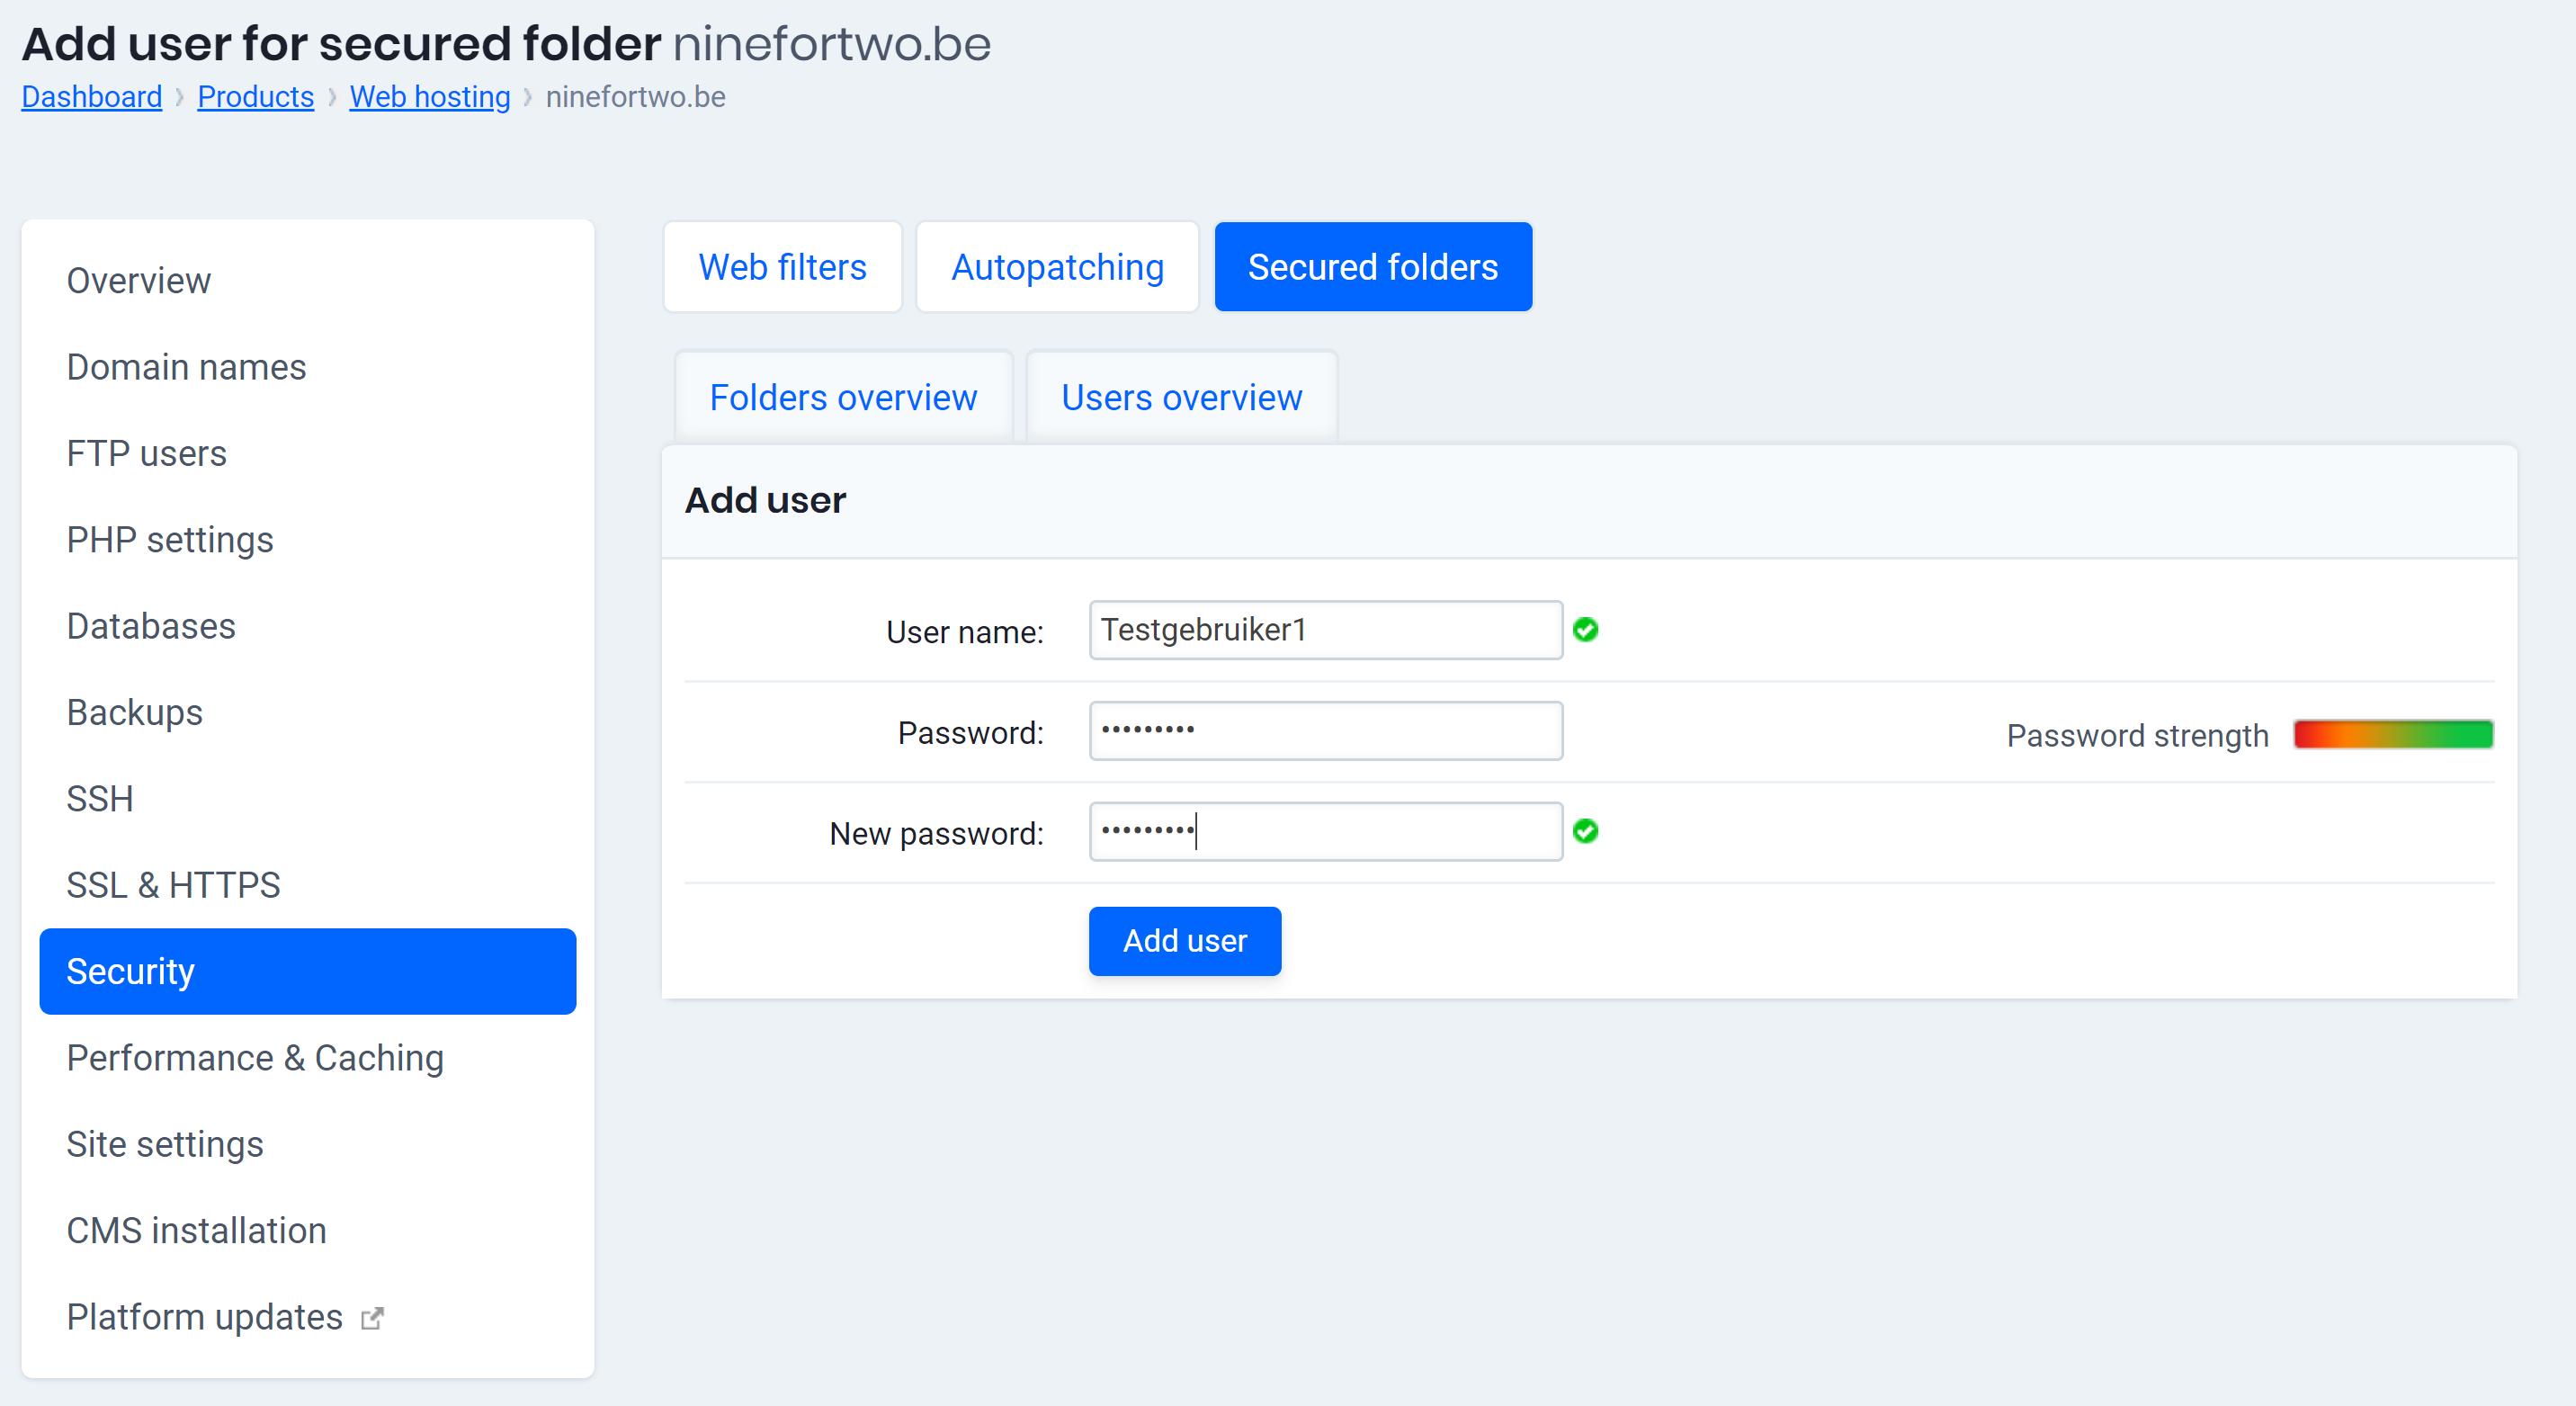 add user for secured folder